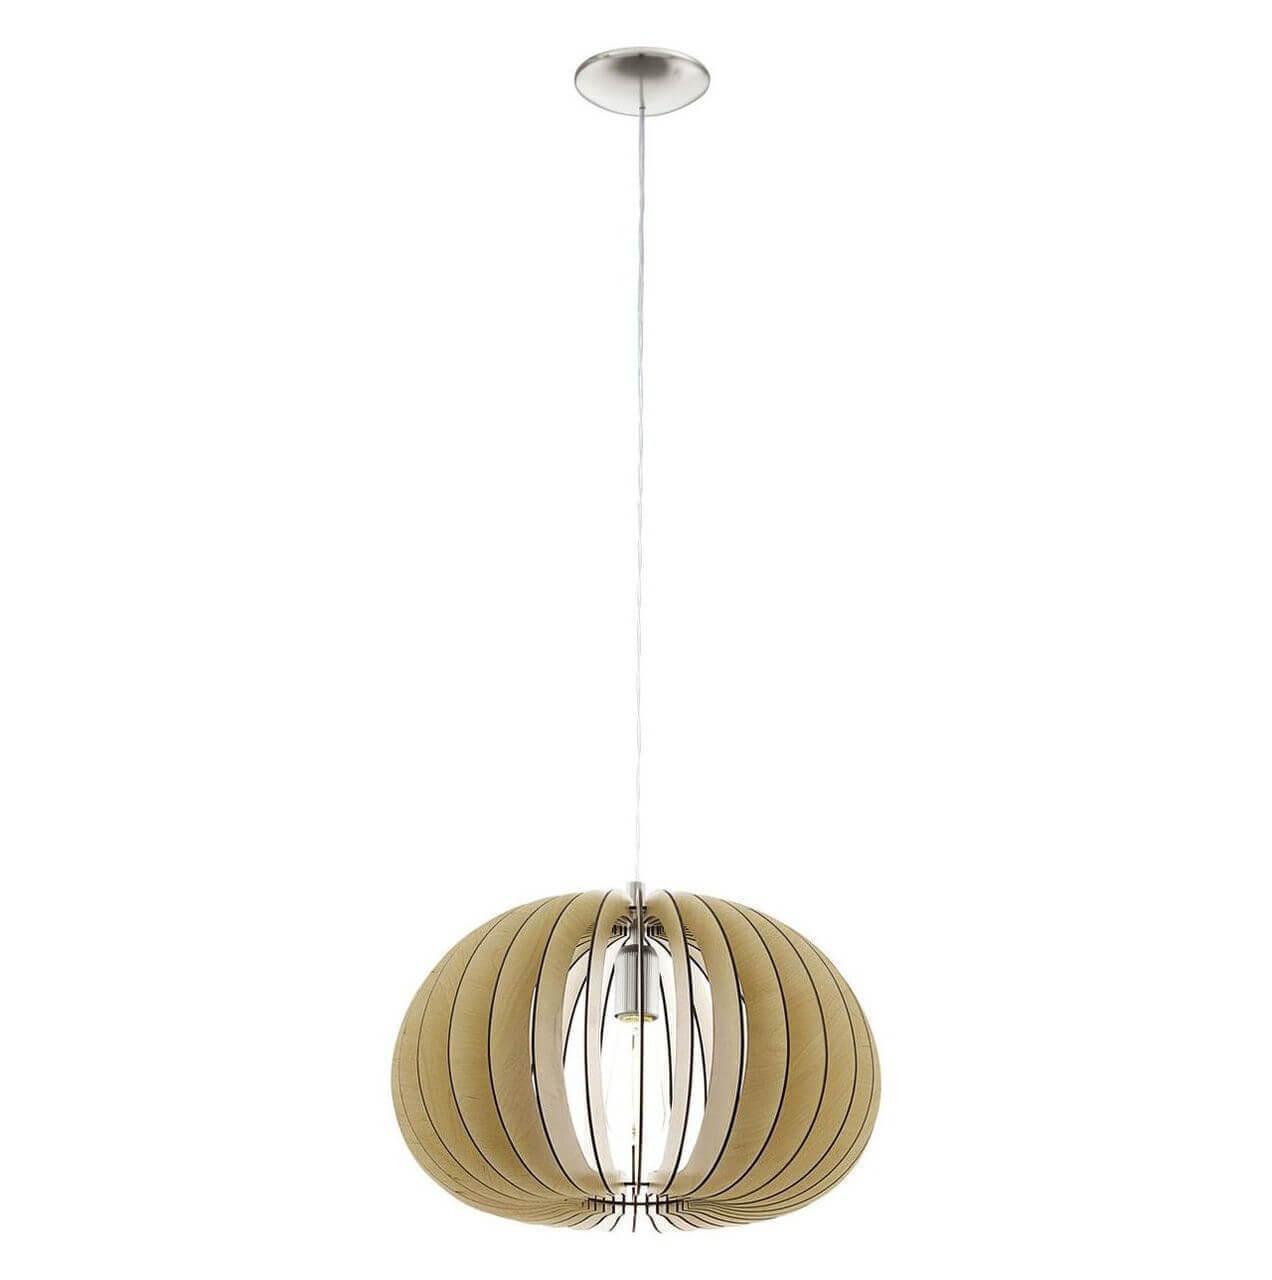 Светильник Eglo 94767 Cossano настольная лампа eglo 94956 cossano